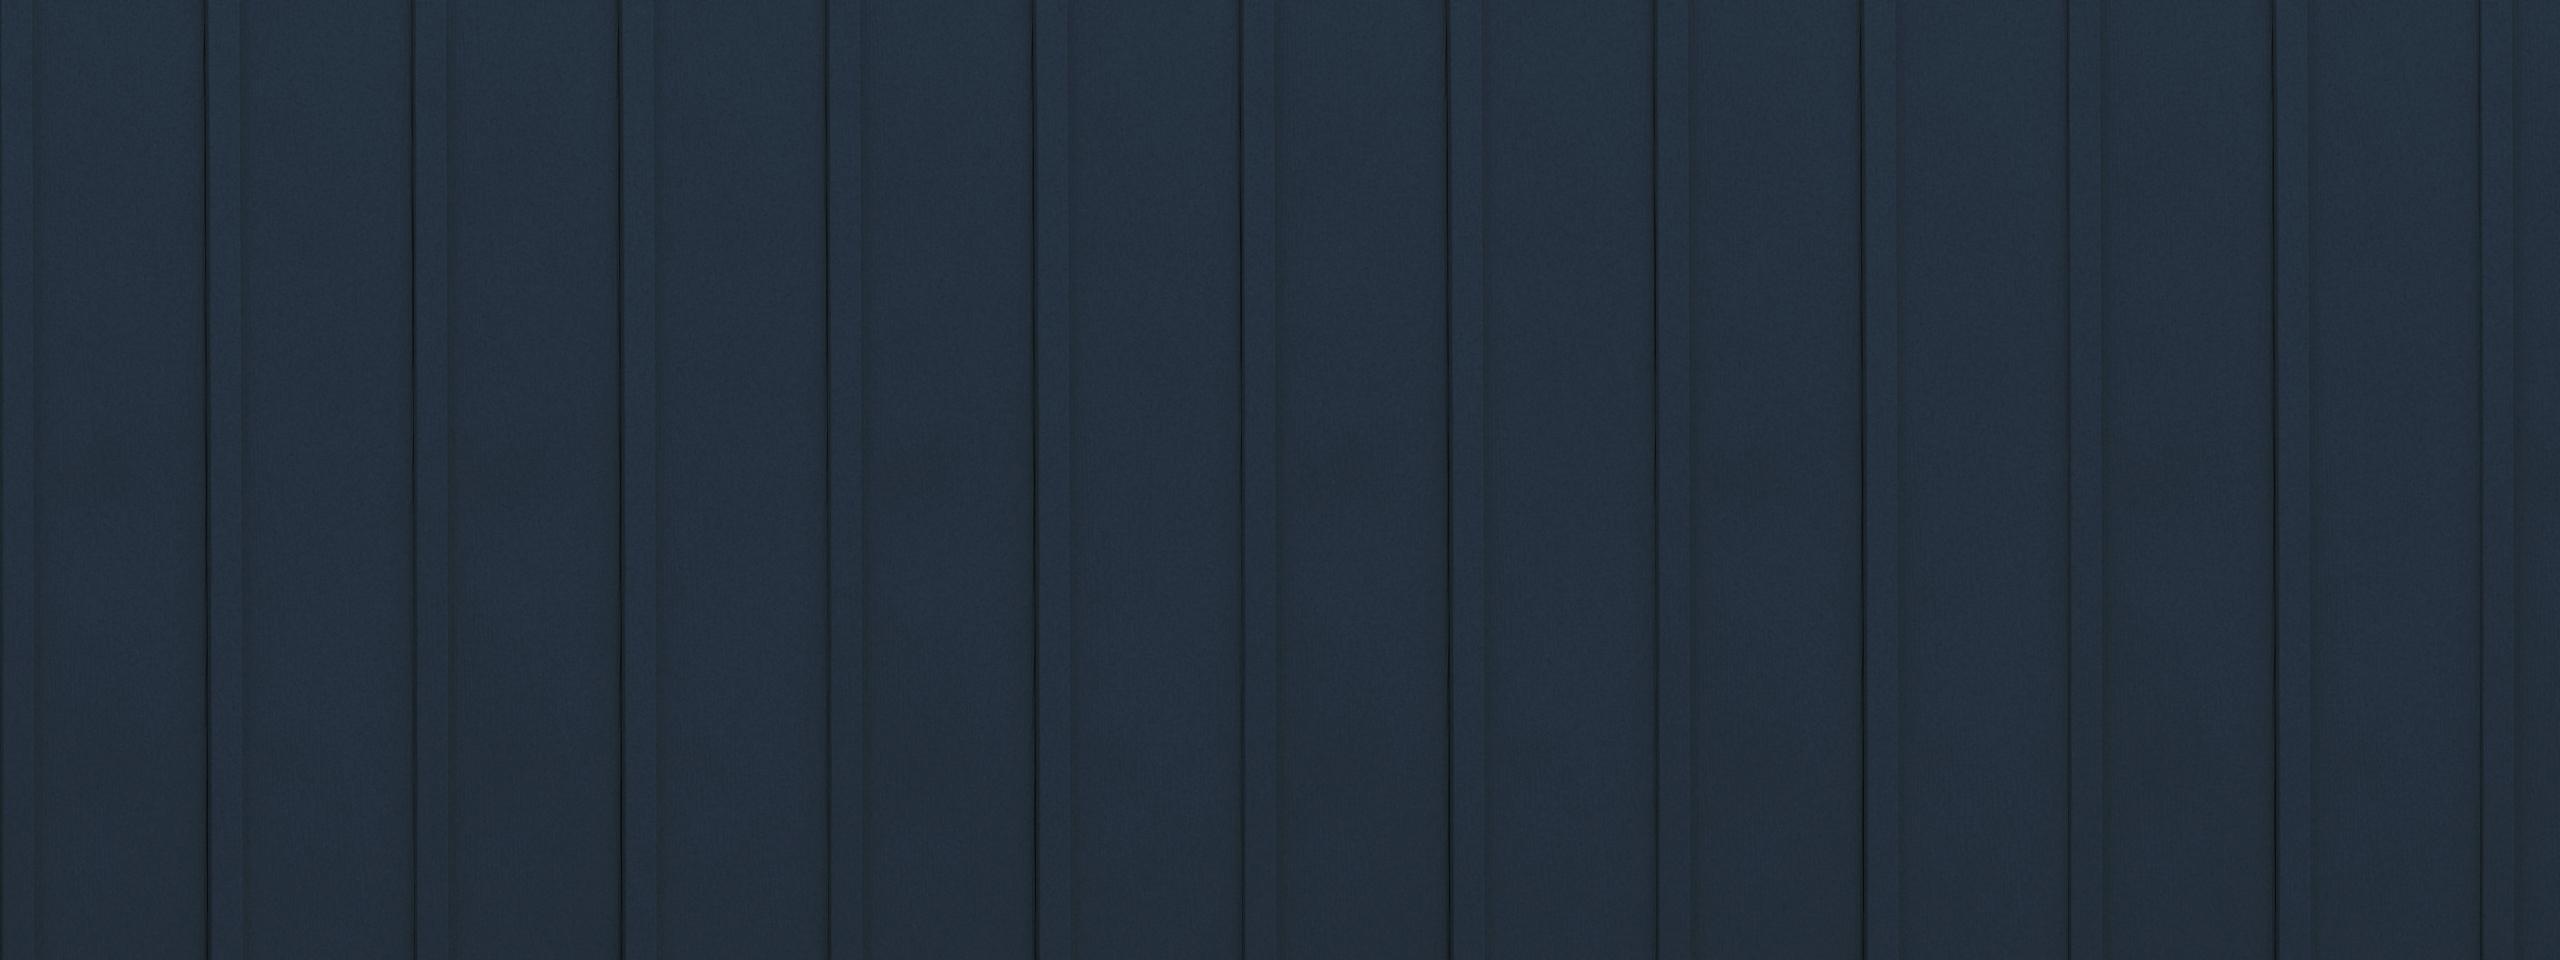 Entex vertical classic blue board and batten steel siding